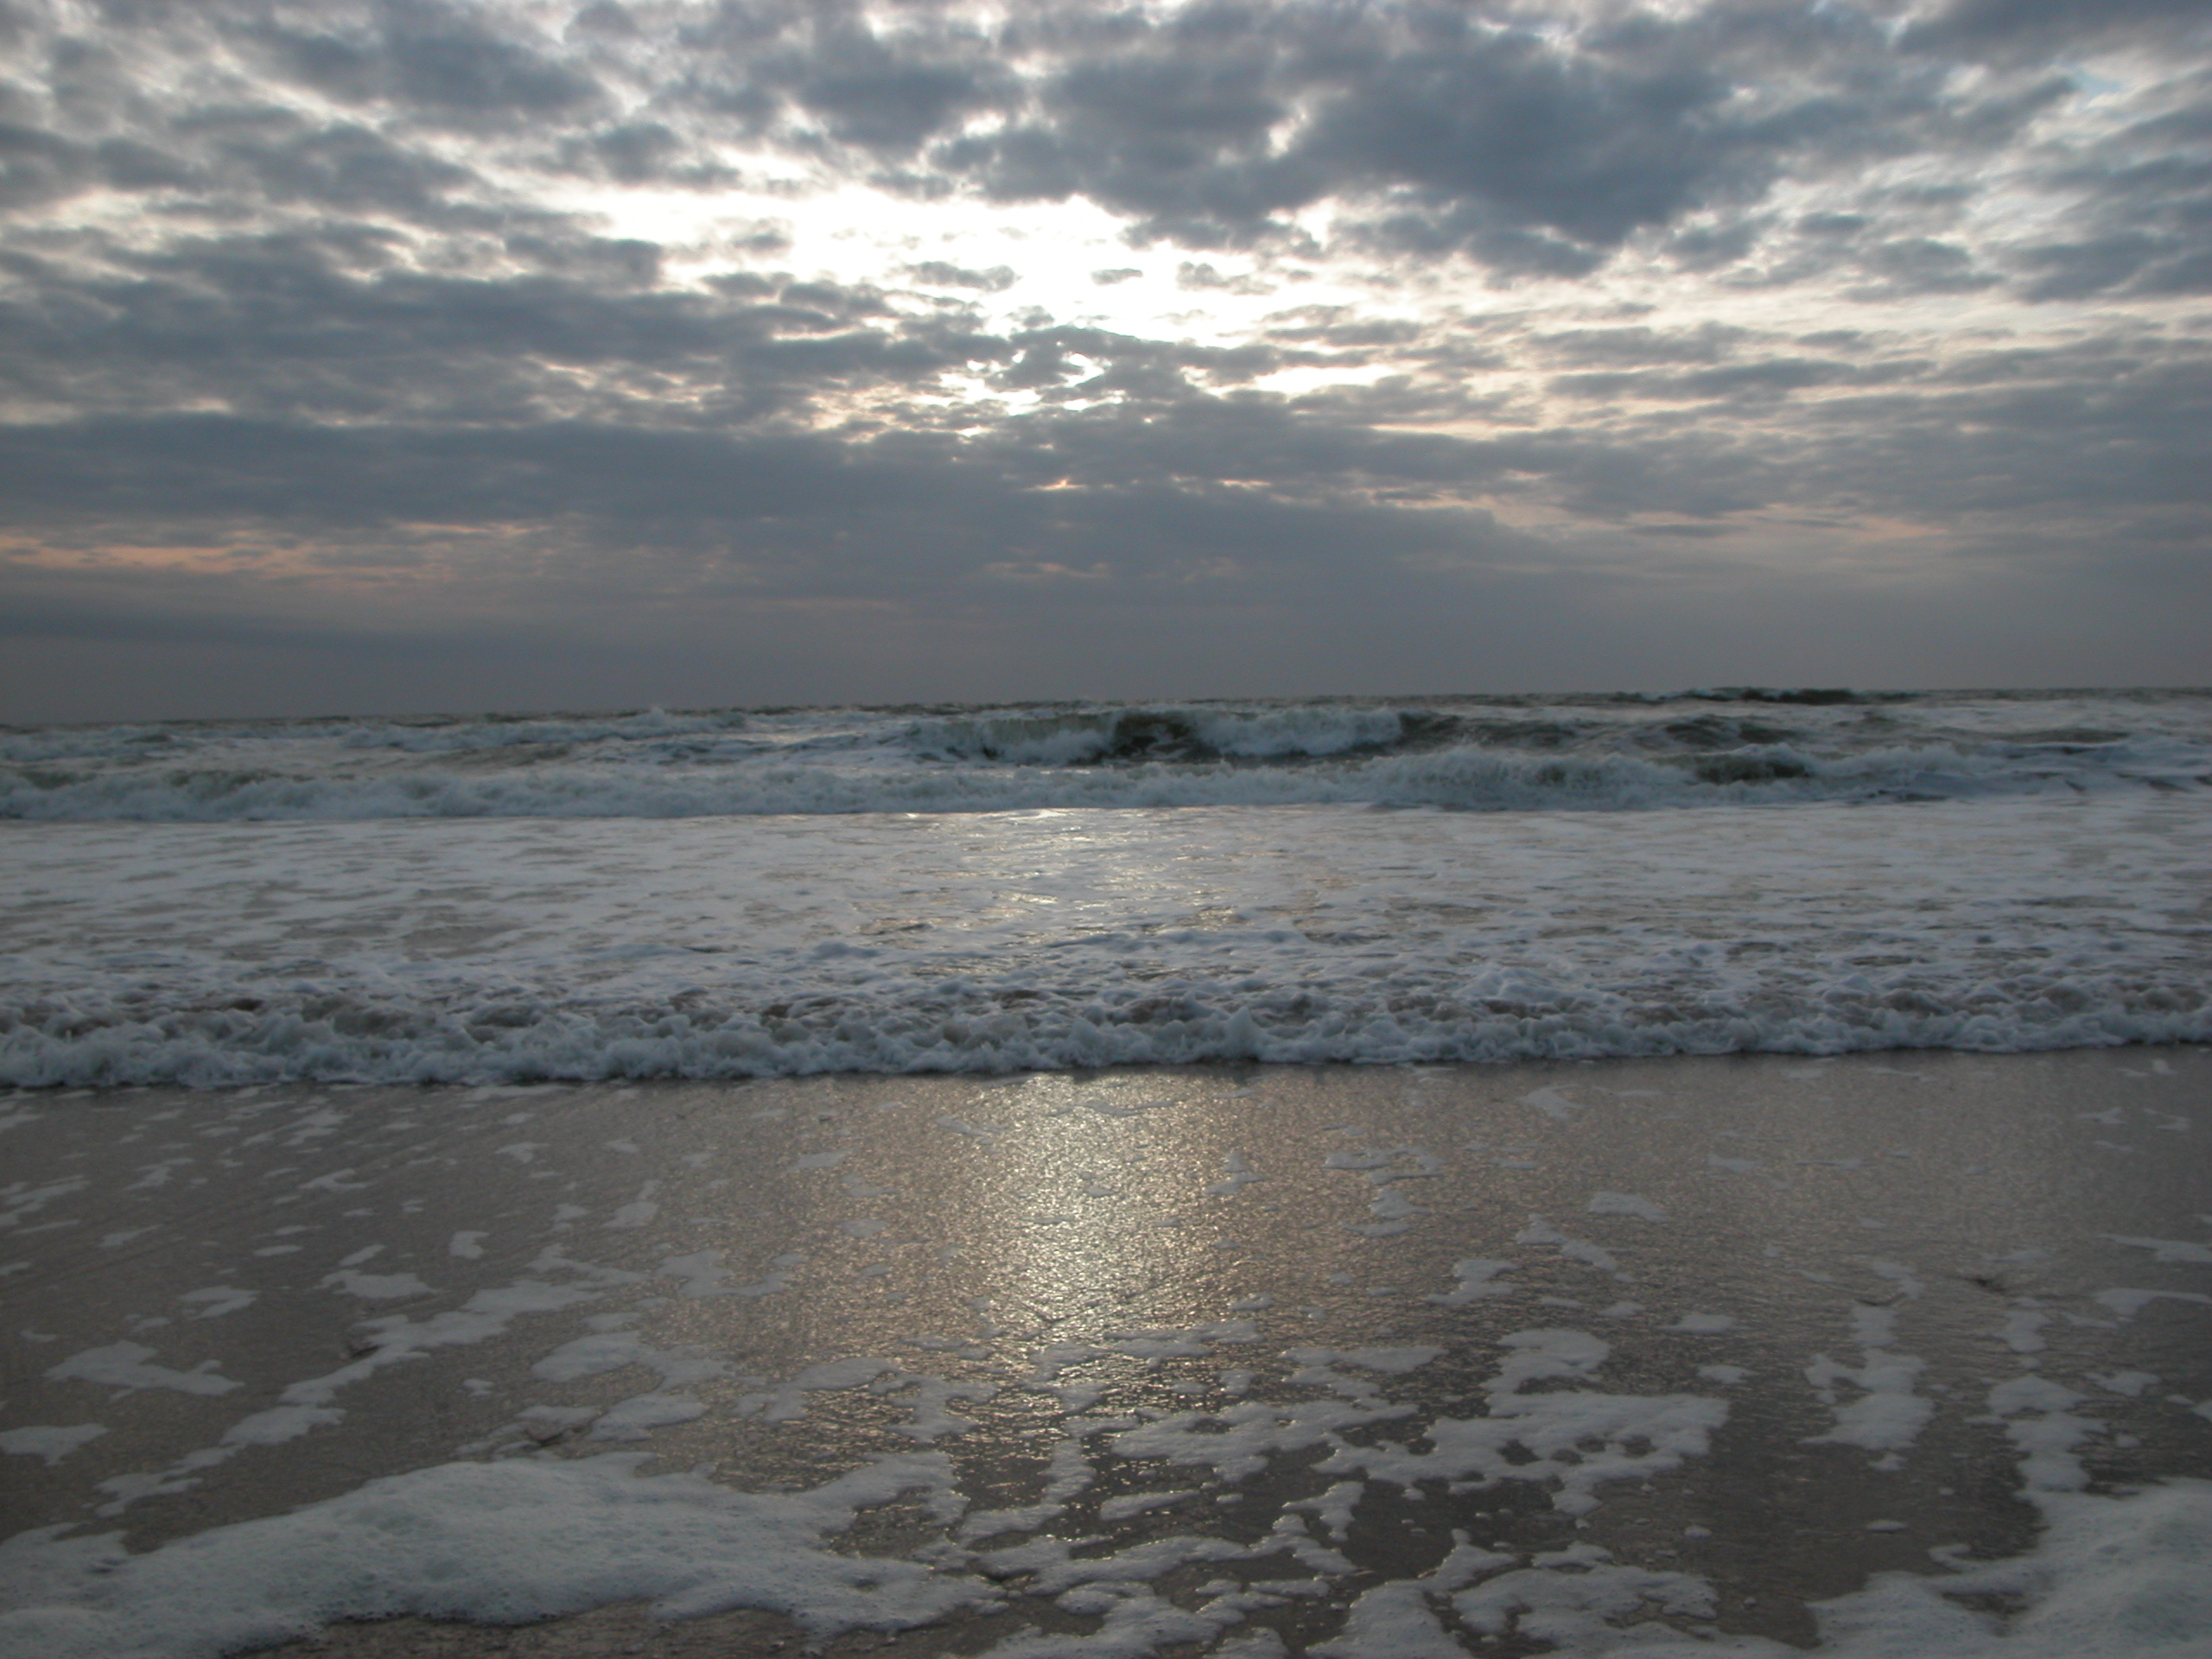 nature landscapes elements water sea ocean waves sky clouds northsea waves